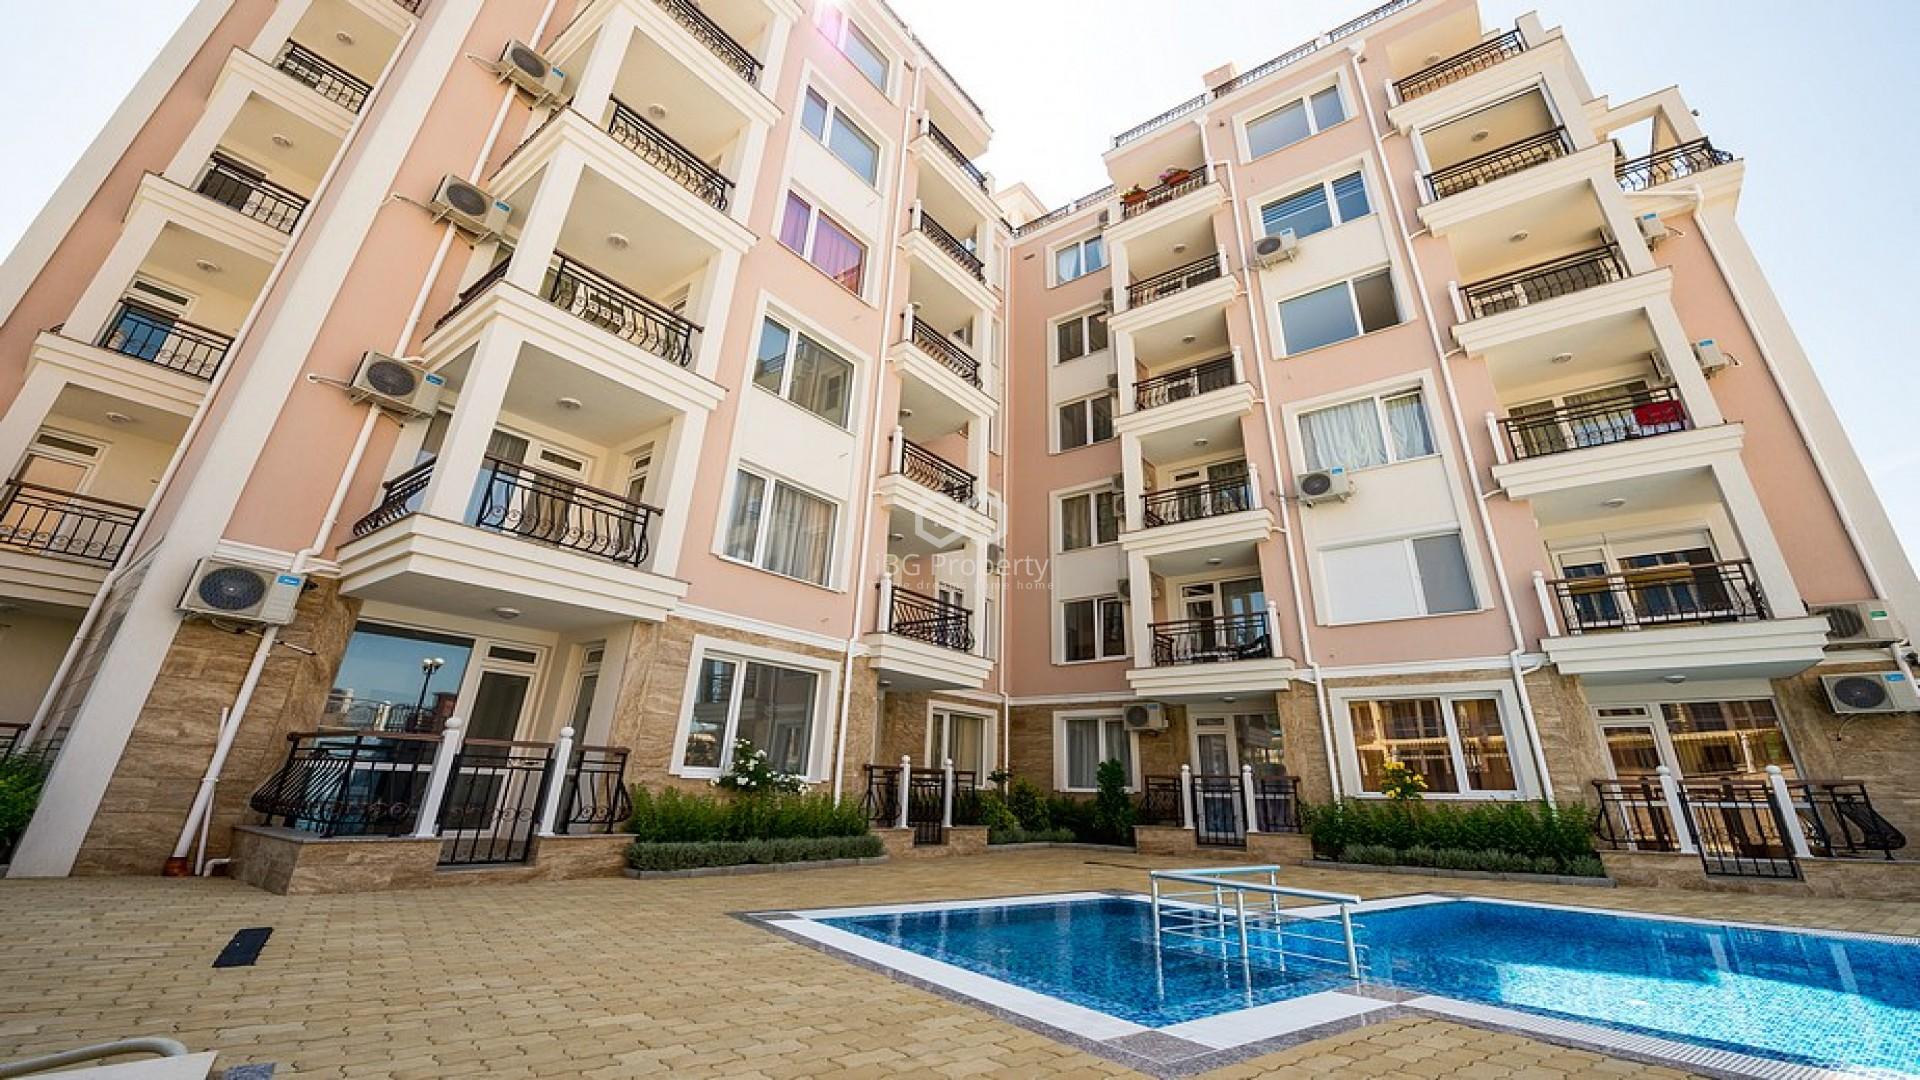 Двухкомнатная квартира Свети Влас 81 m2